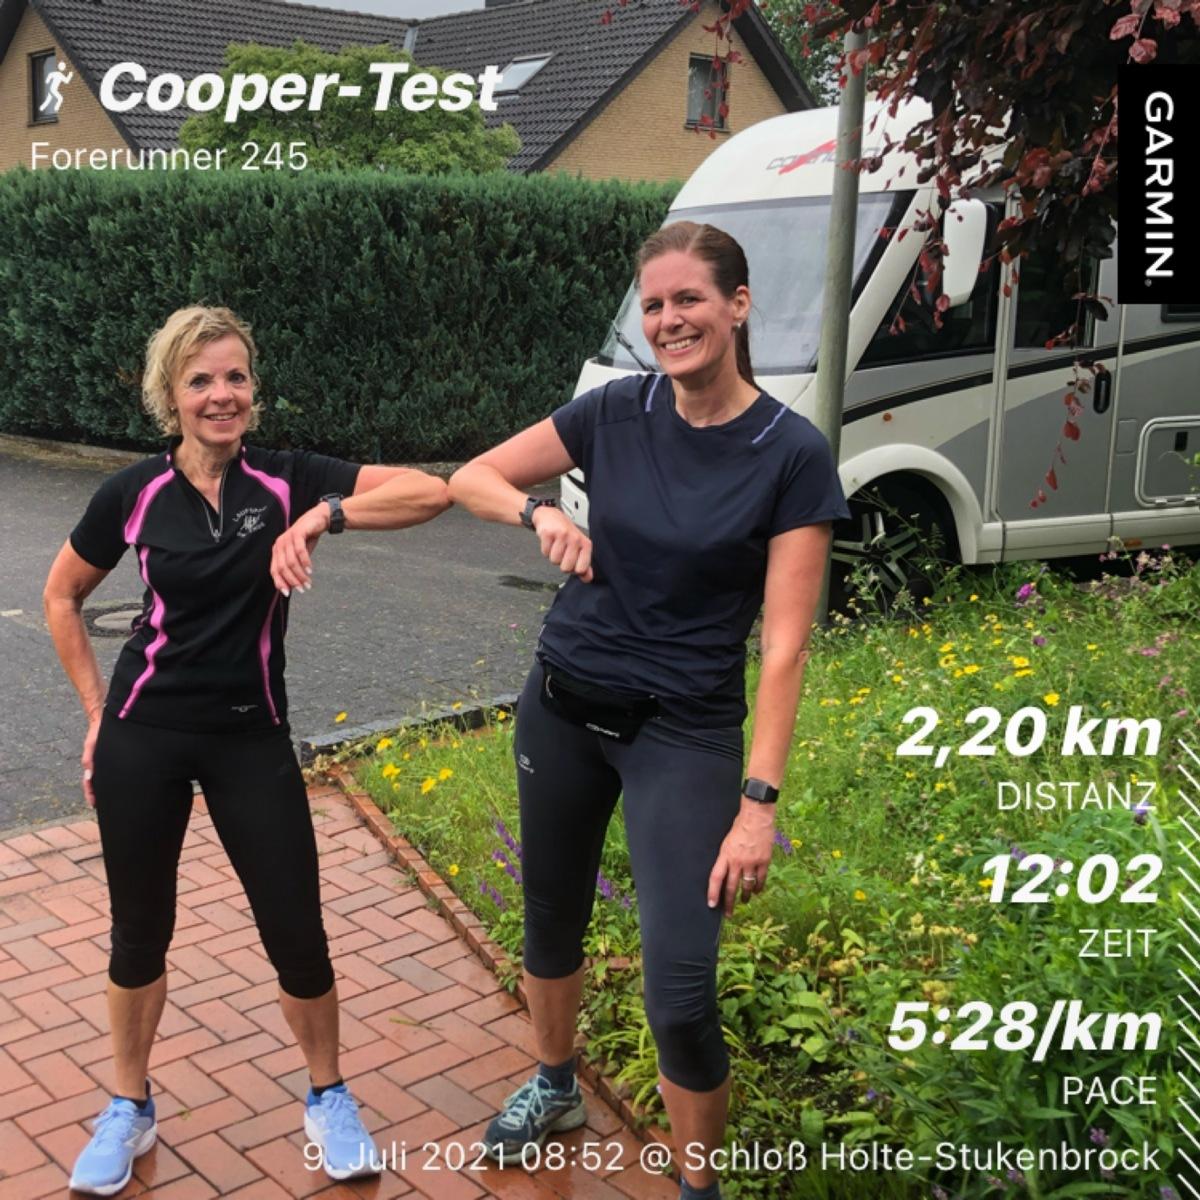 Wemhoff-Michaela-25-Challenge-Cooper-Test-bhUbg